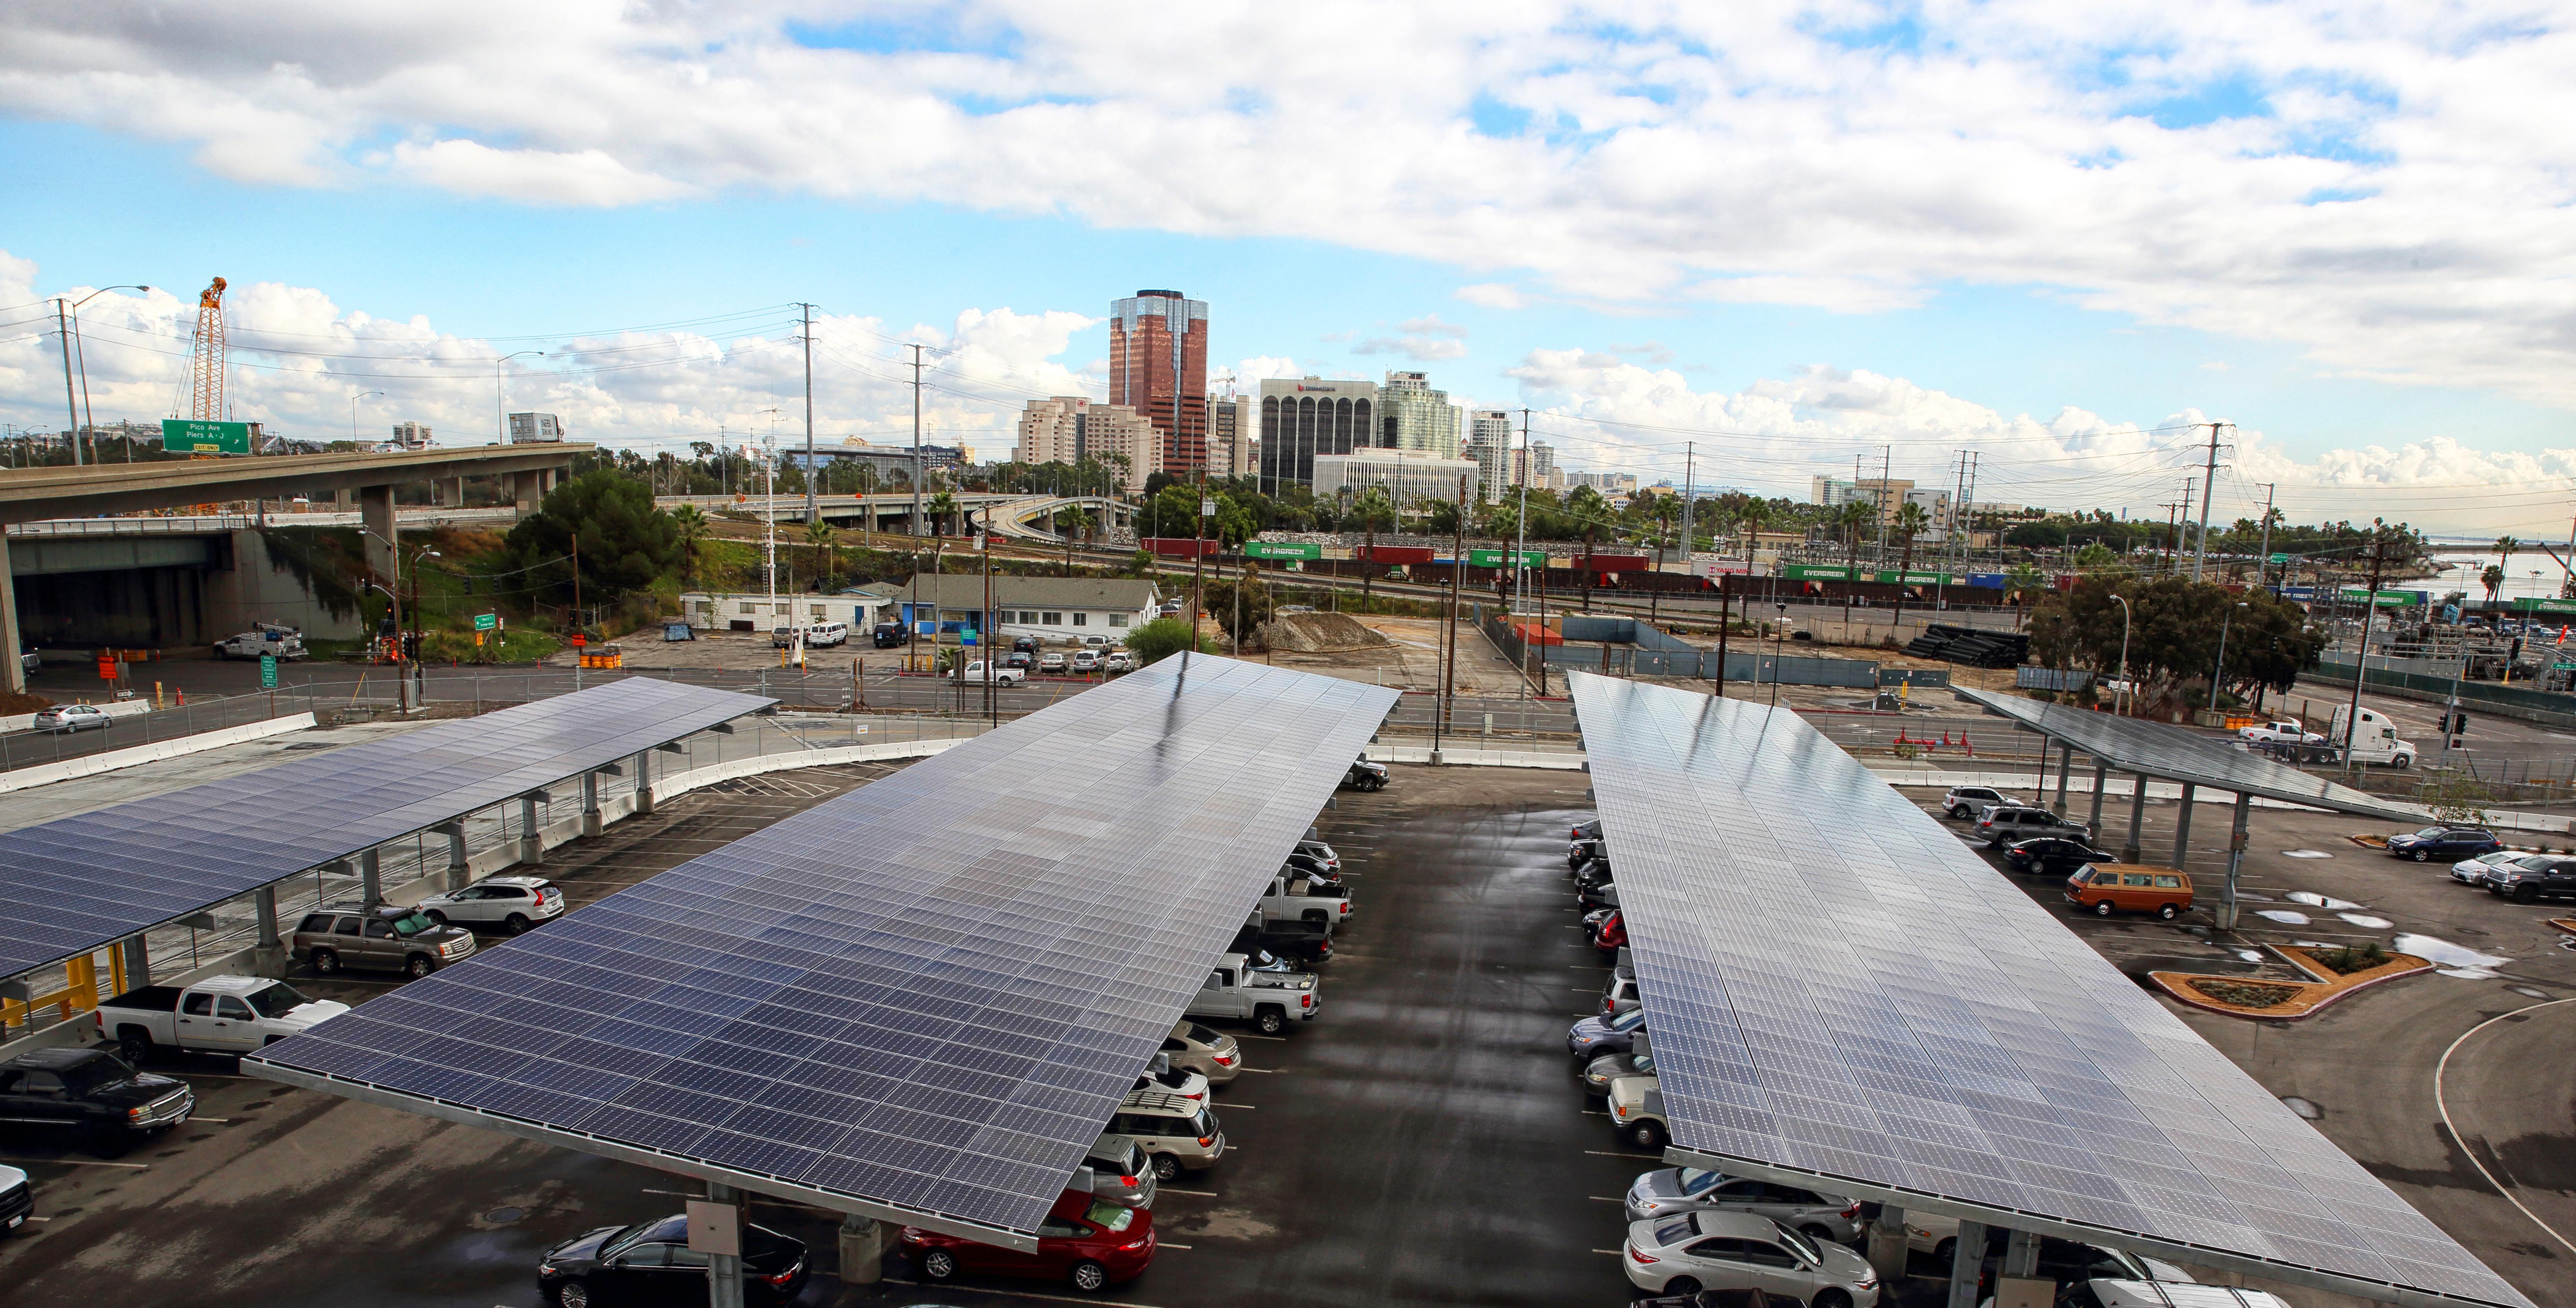 The 3,290 Mitsubishi Electric solar panels cover carports at Long Beach Container Terminal. (Photo: Glen Marzano)